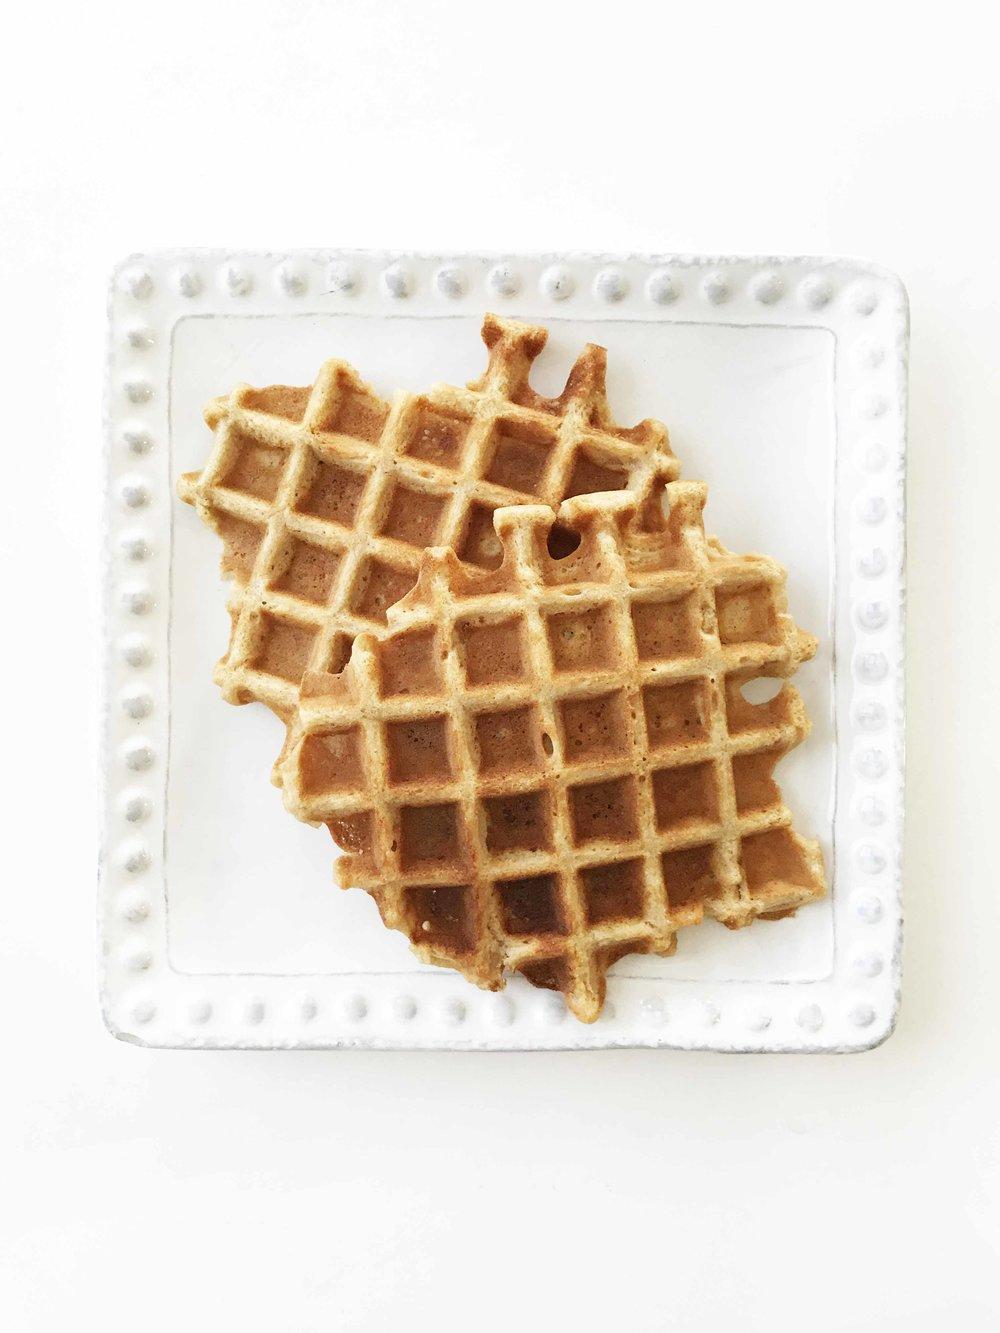 pbj-waffles10.jpg